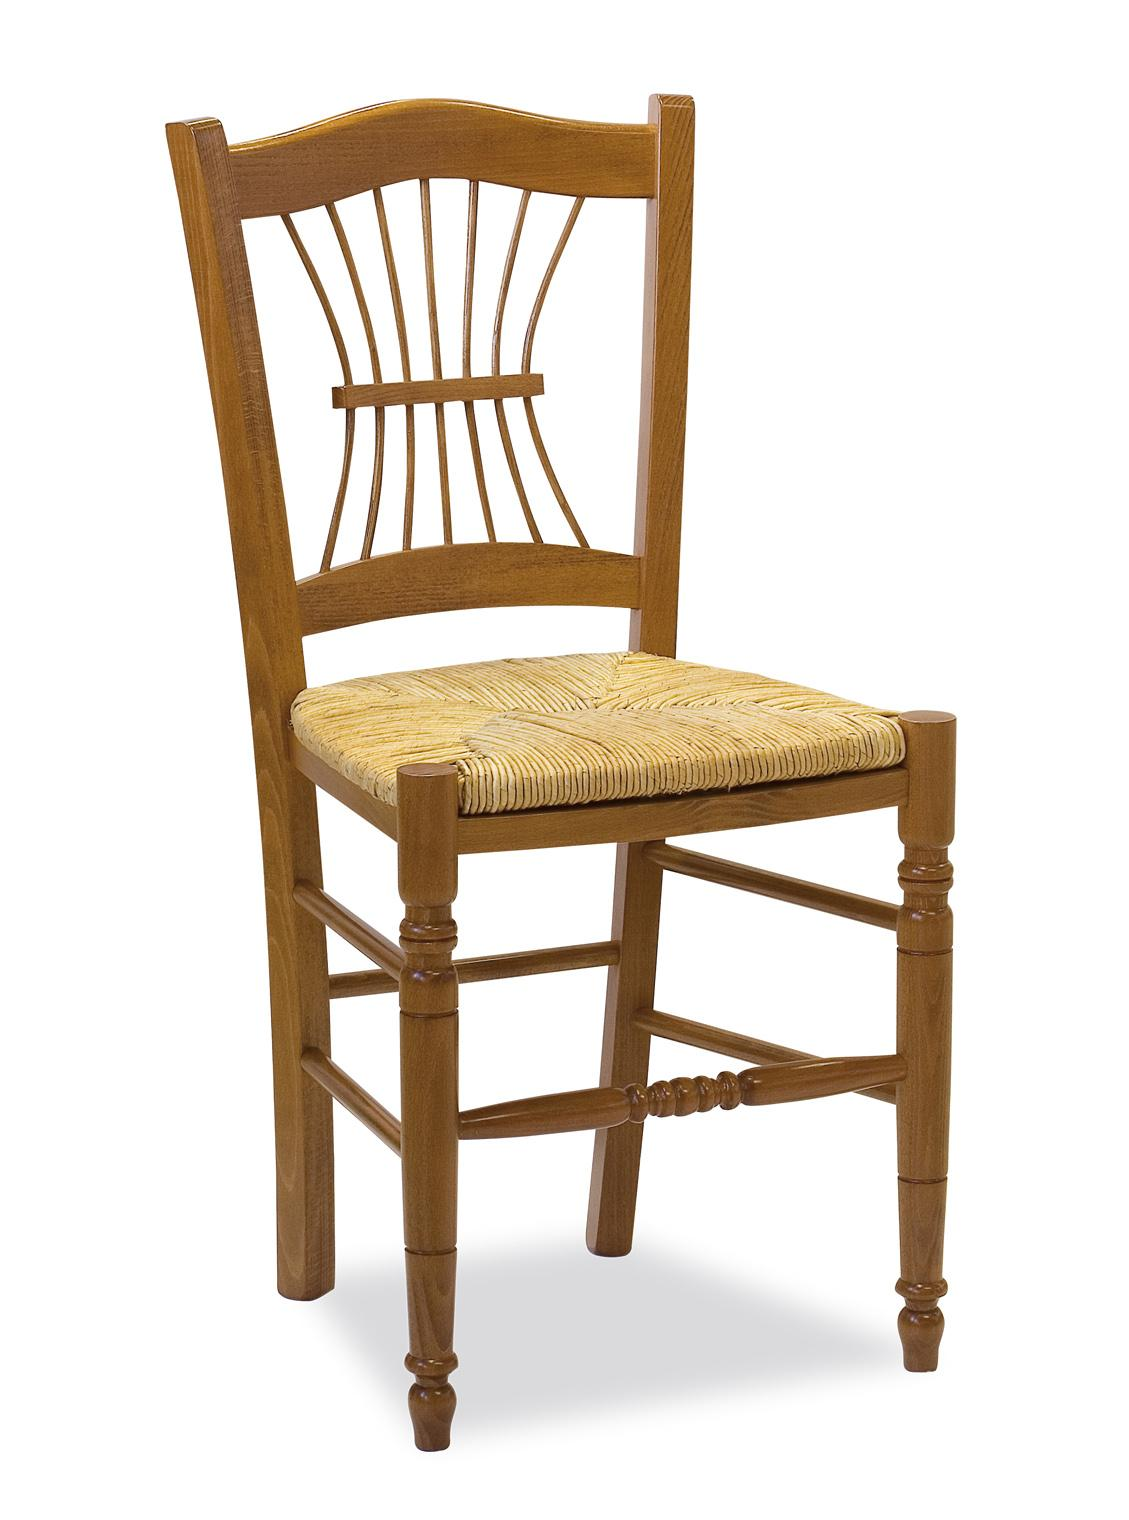 Sillas de comedor dise o 4 0 10000 0 piezas for Tipos de sillas para comedor